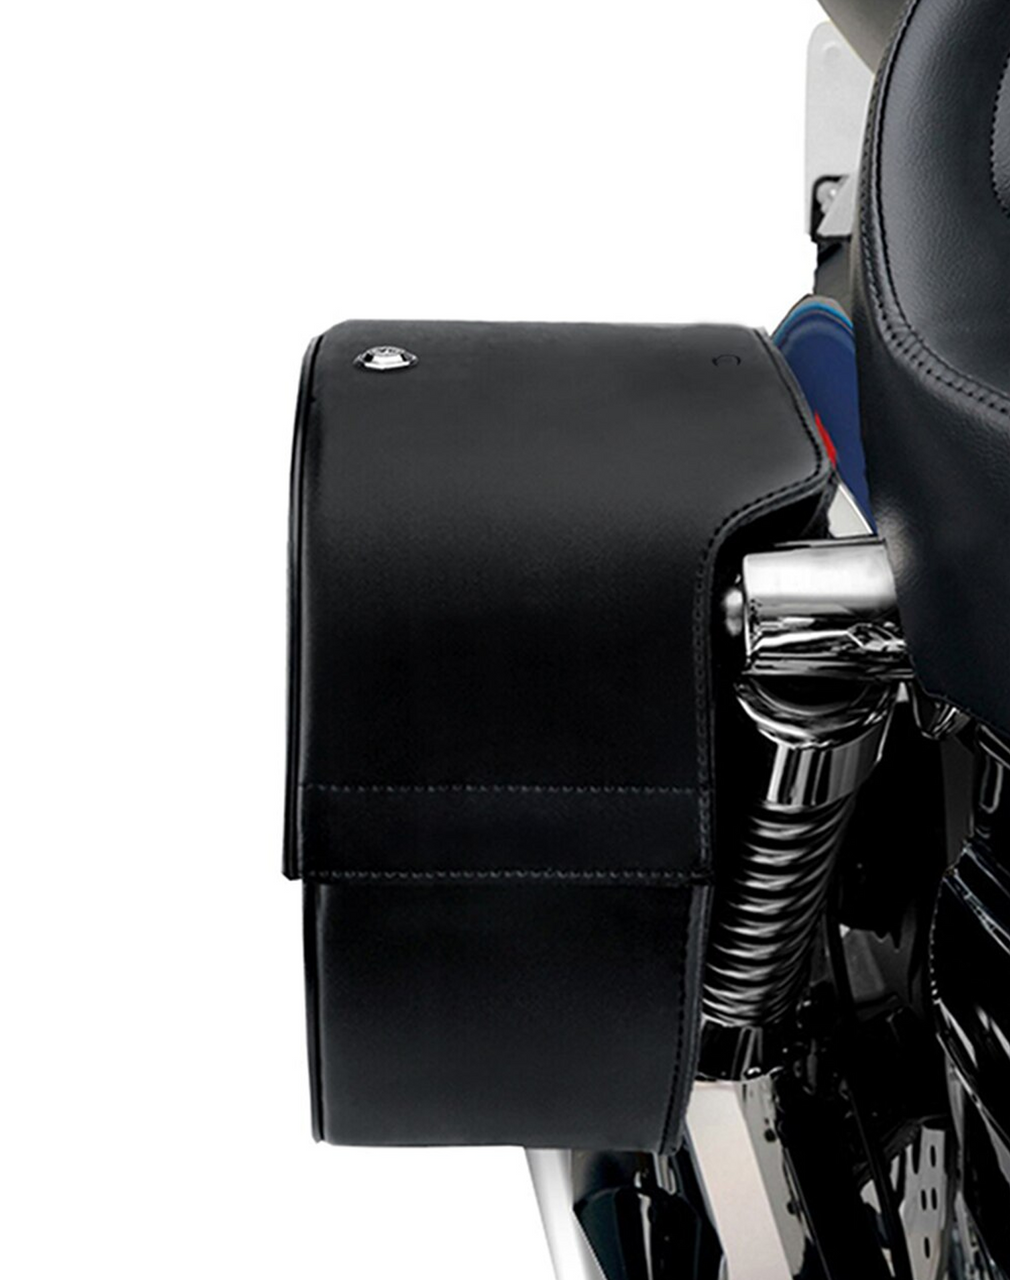 Honda VTX 1300 C Large SS Shock Cutout Slanted Studded Motorcycle Saddlebags Shock Cutout view